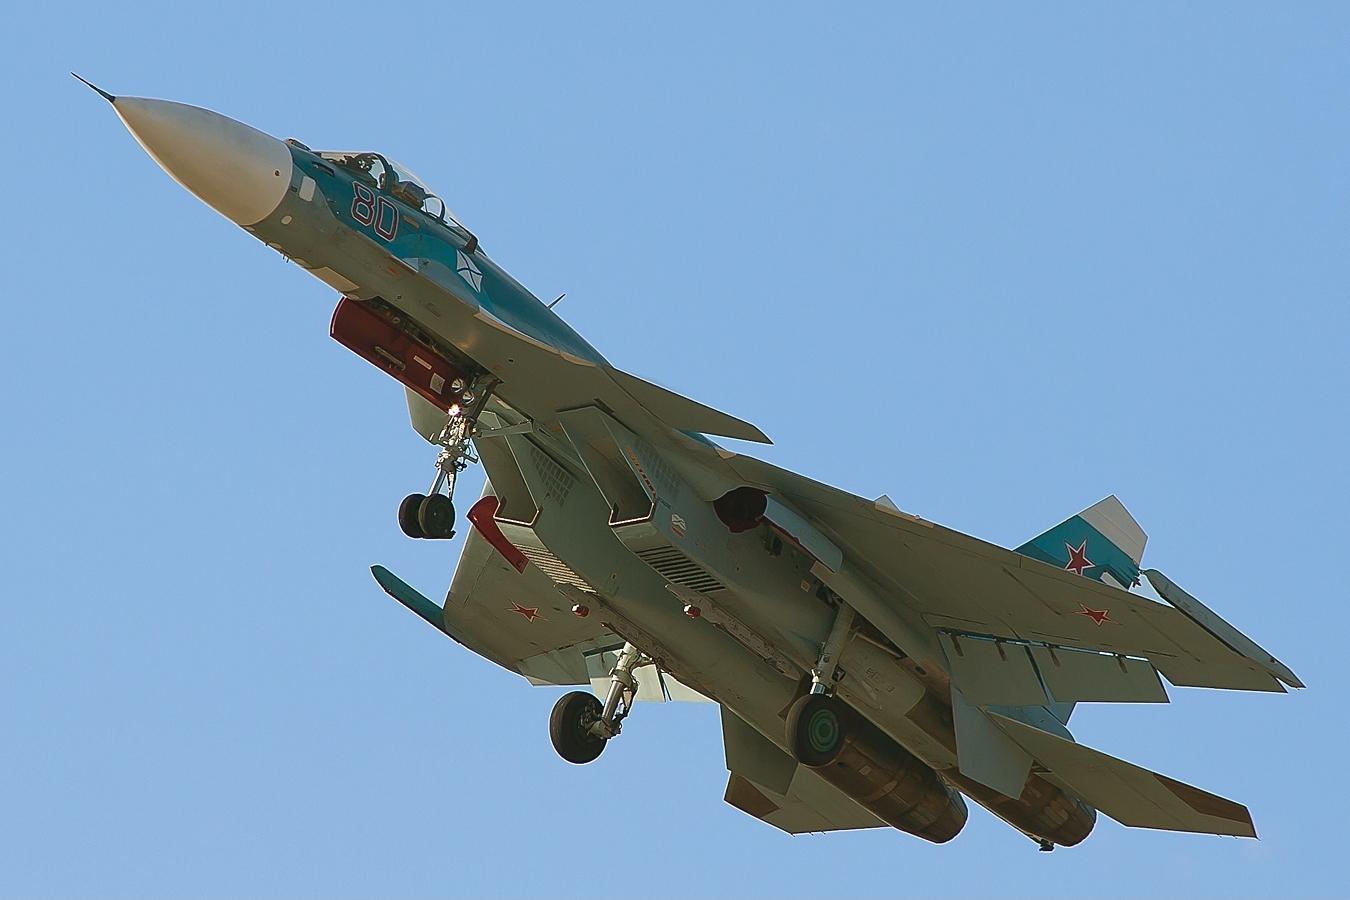 Su 33 (航空機)の画像 p1_20